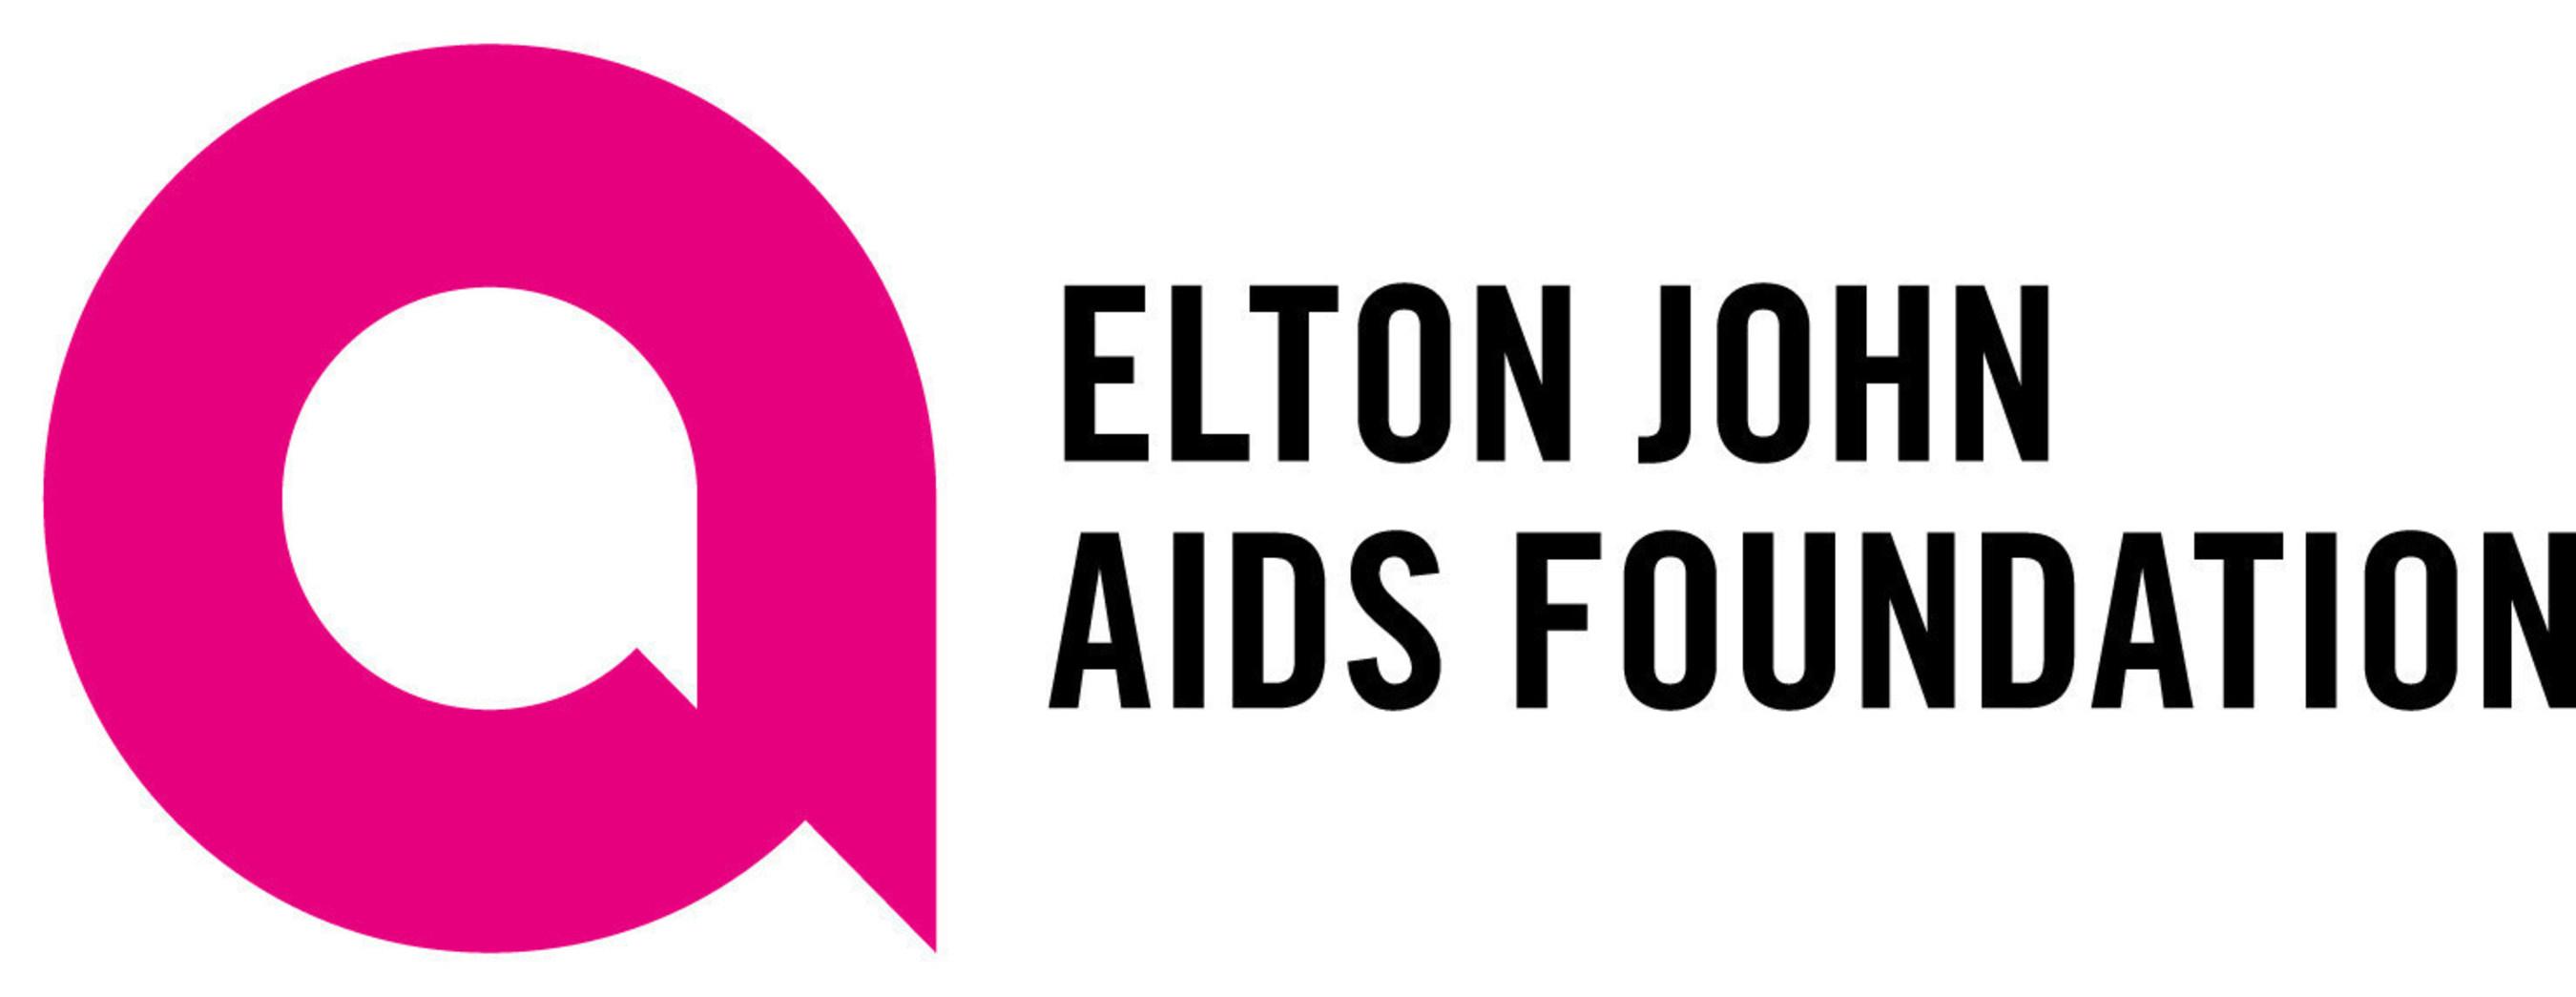 Elton John AIDS Foundation logo.